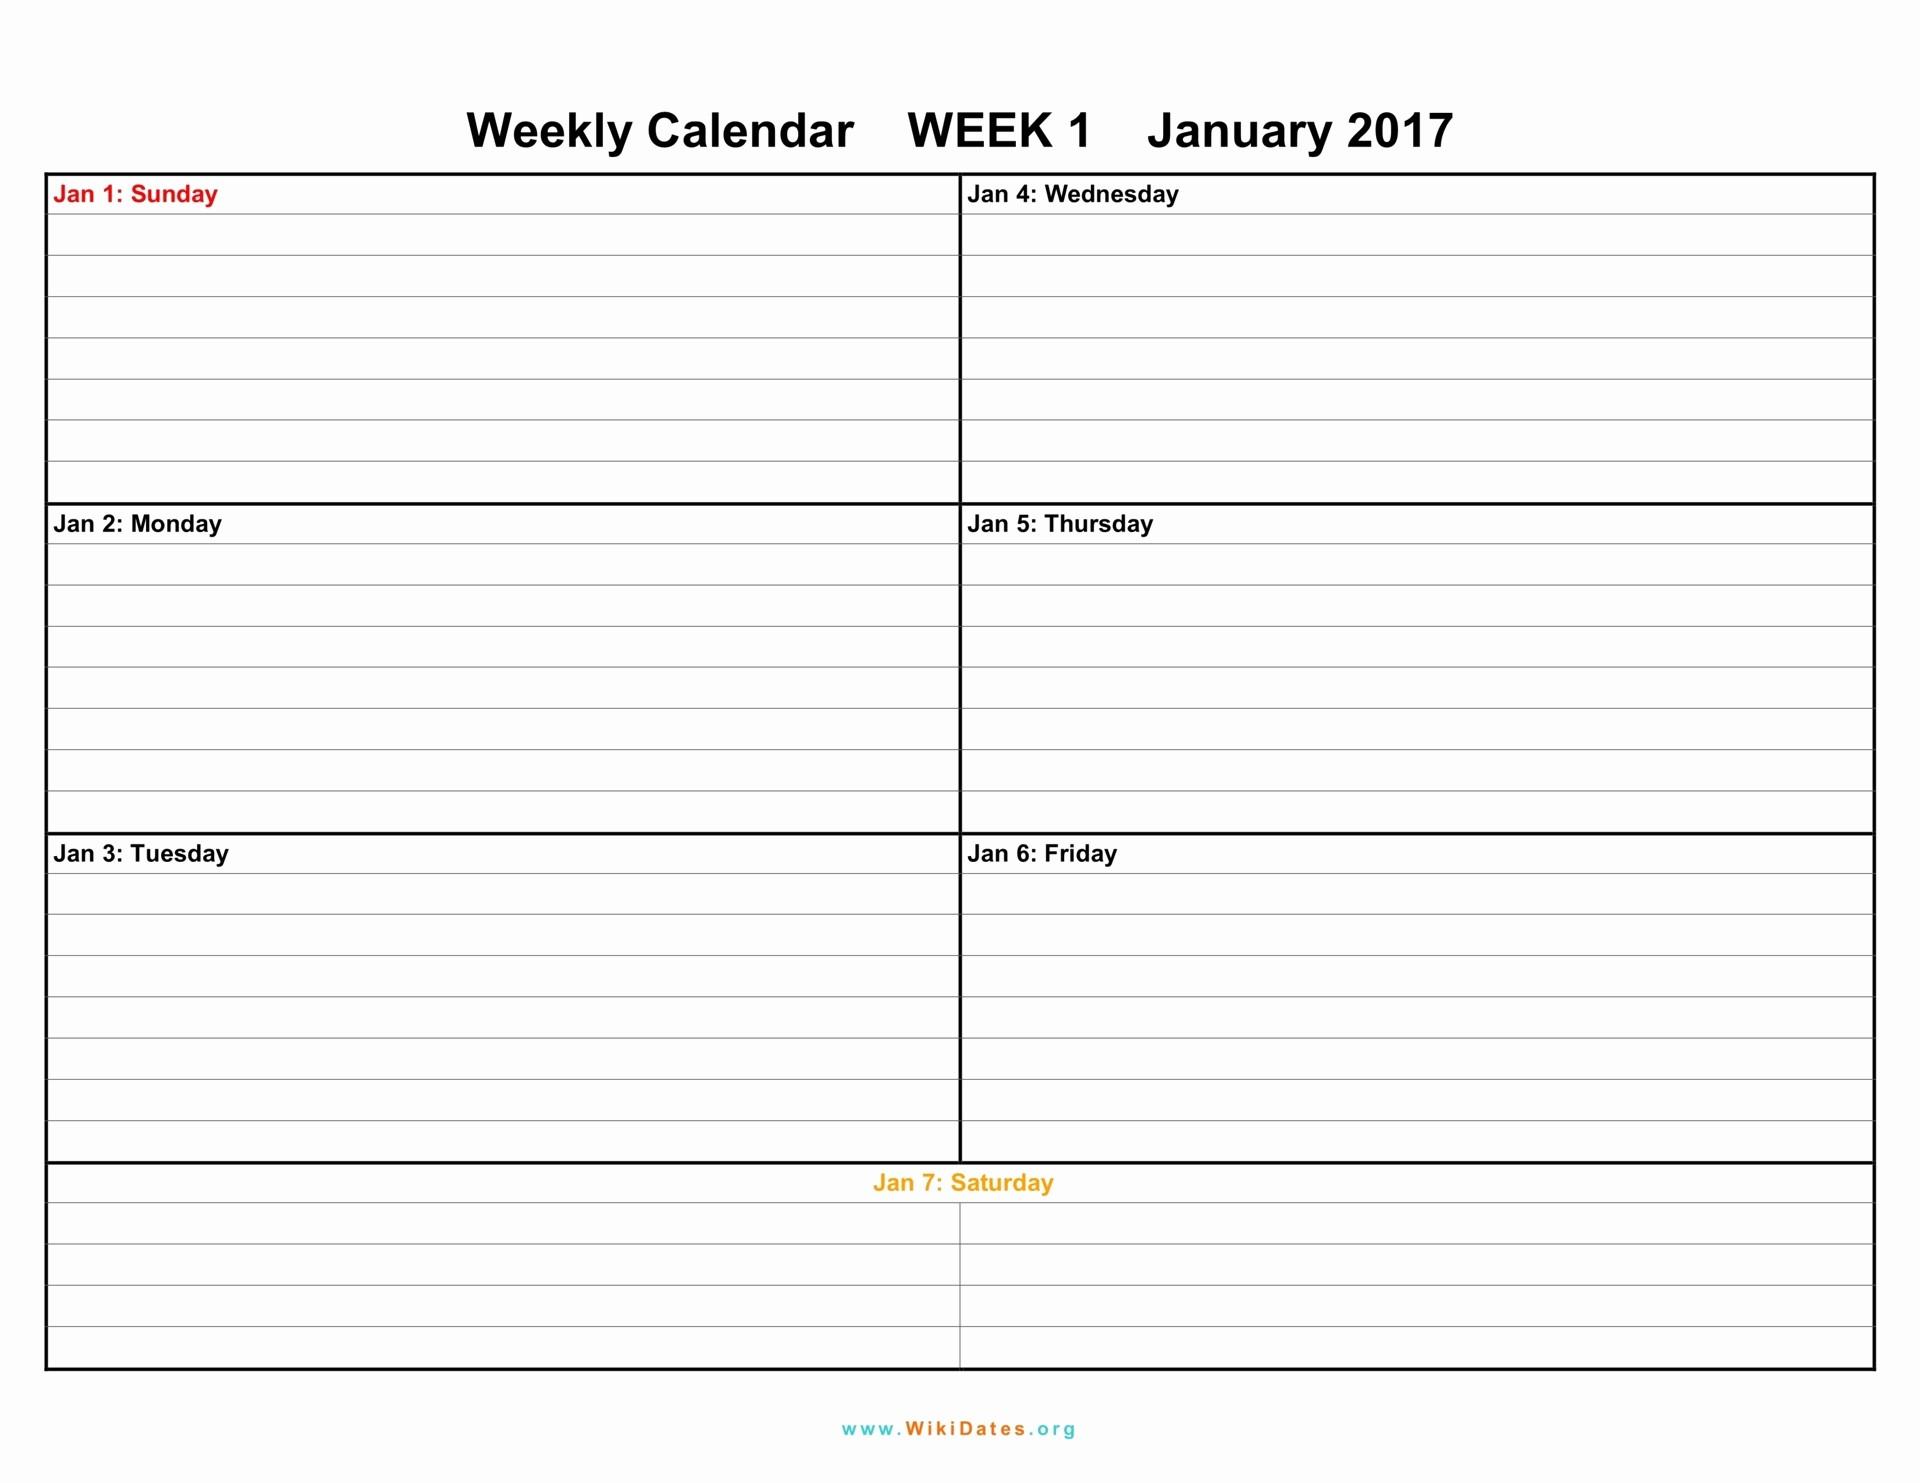 Free Printable Weekly Calendars 2017 Inspirational Weekly Calendar Download Weekly Calendar 2017 and 2018